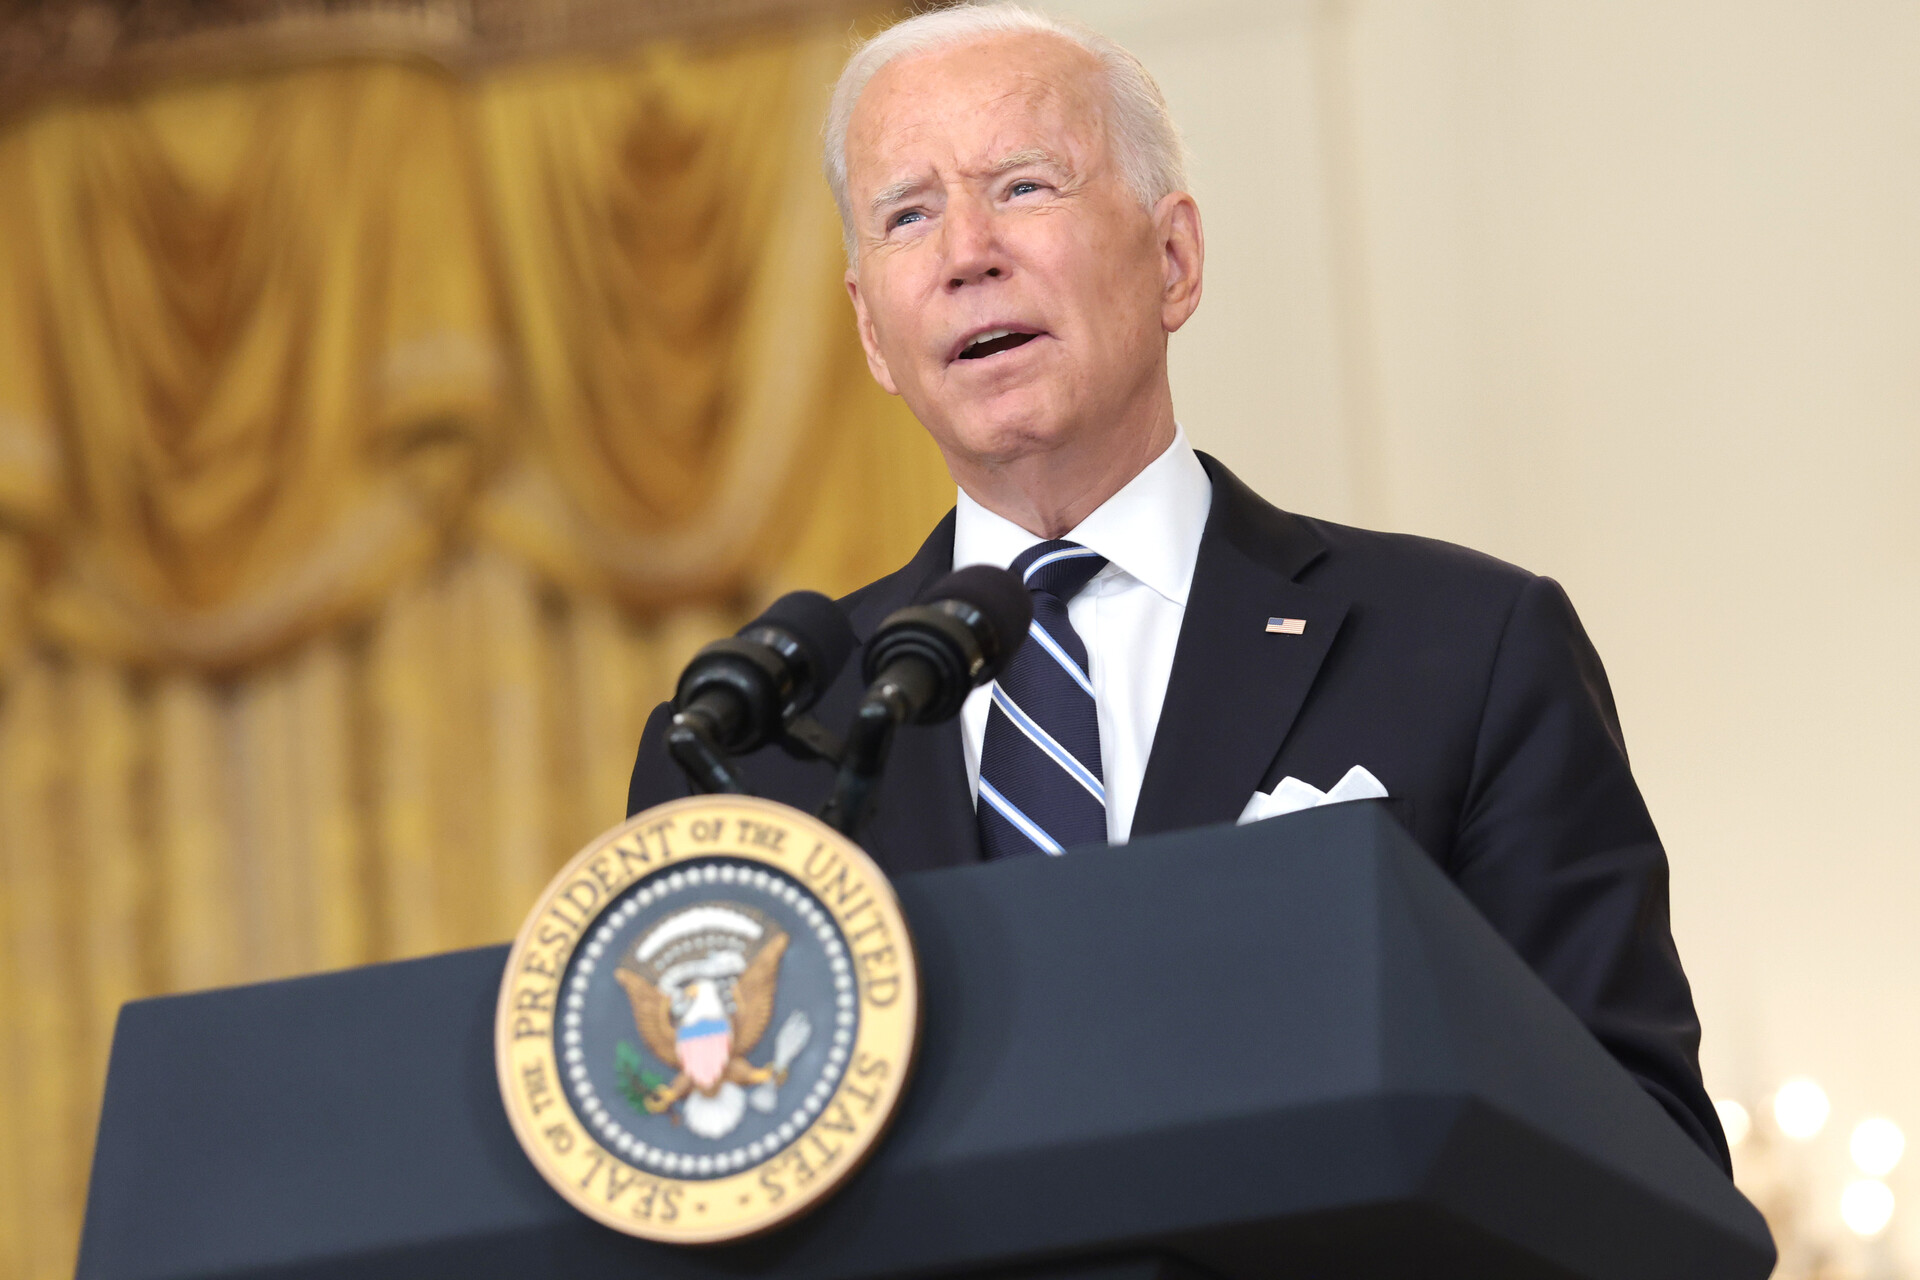 President Biden speaks at a podium.